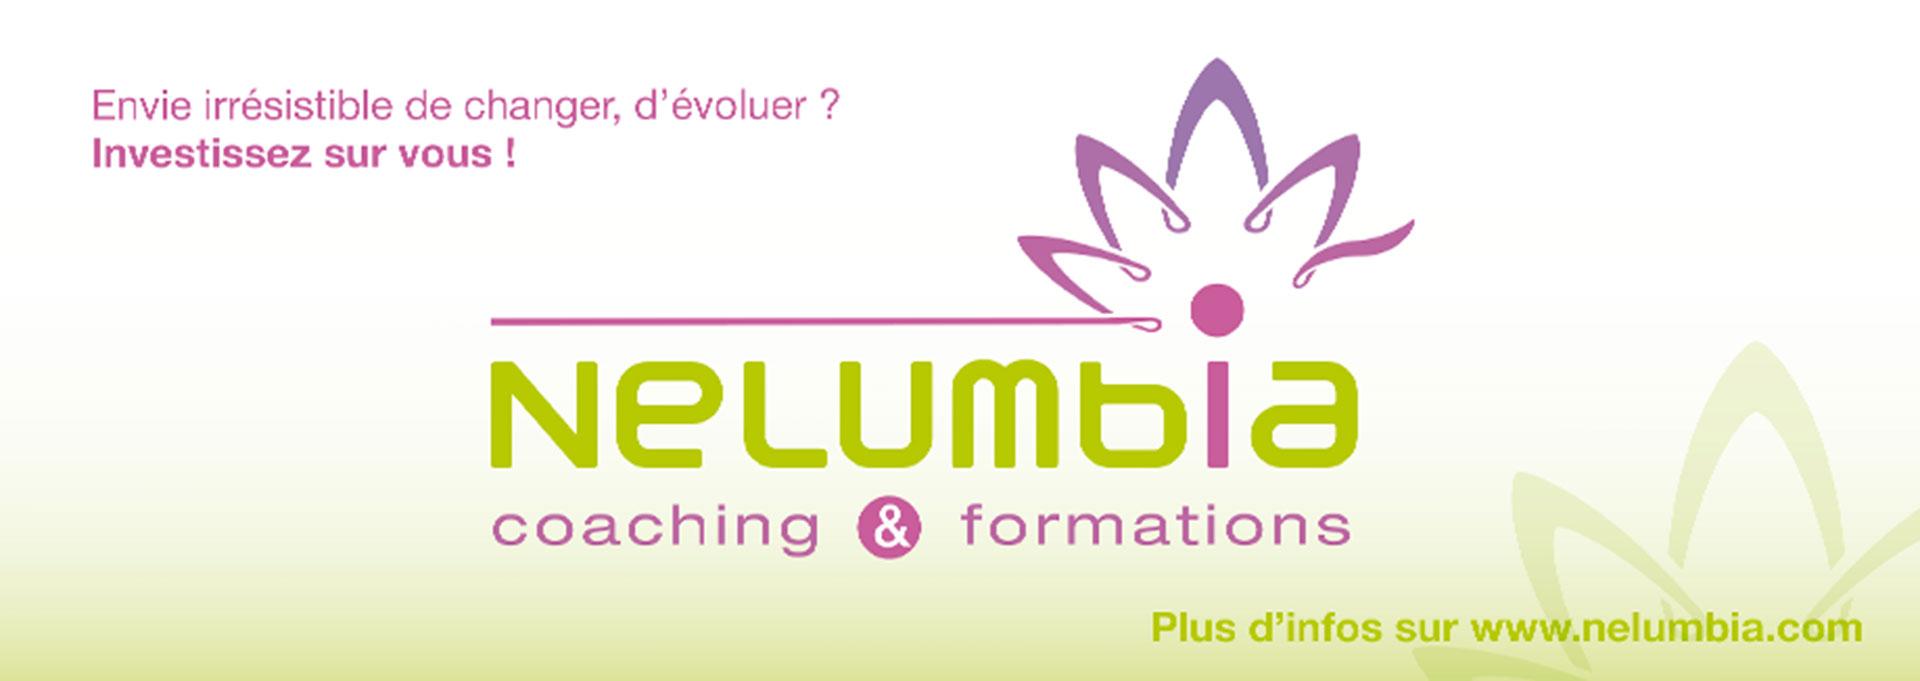 Nelumbia développement personnel